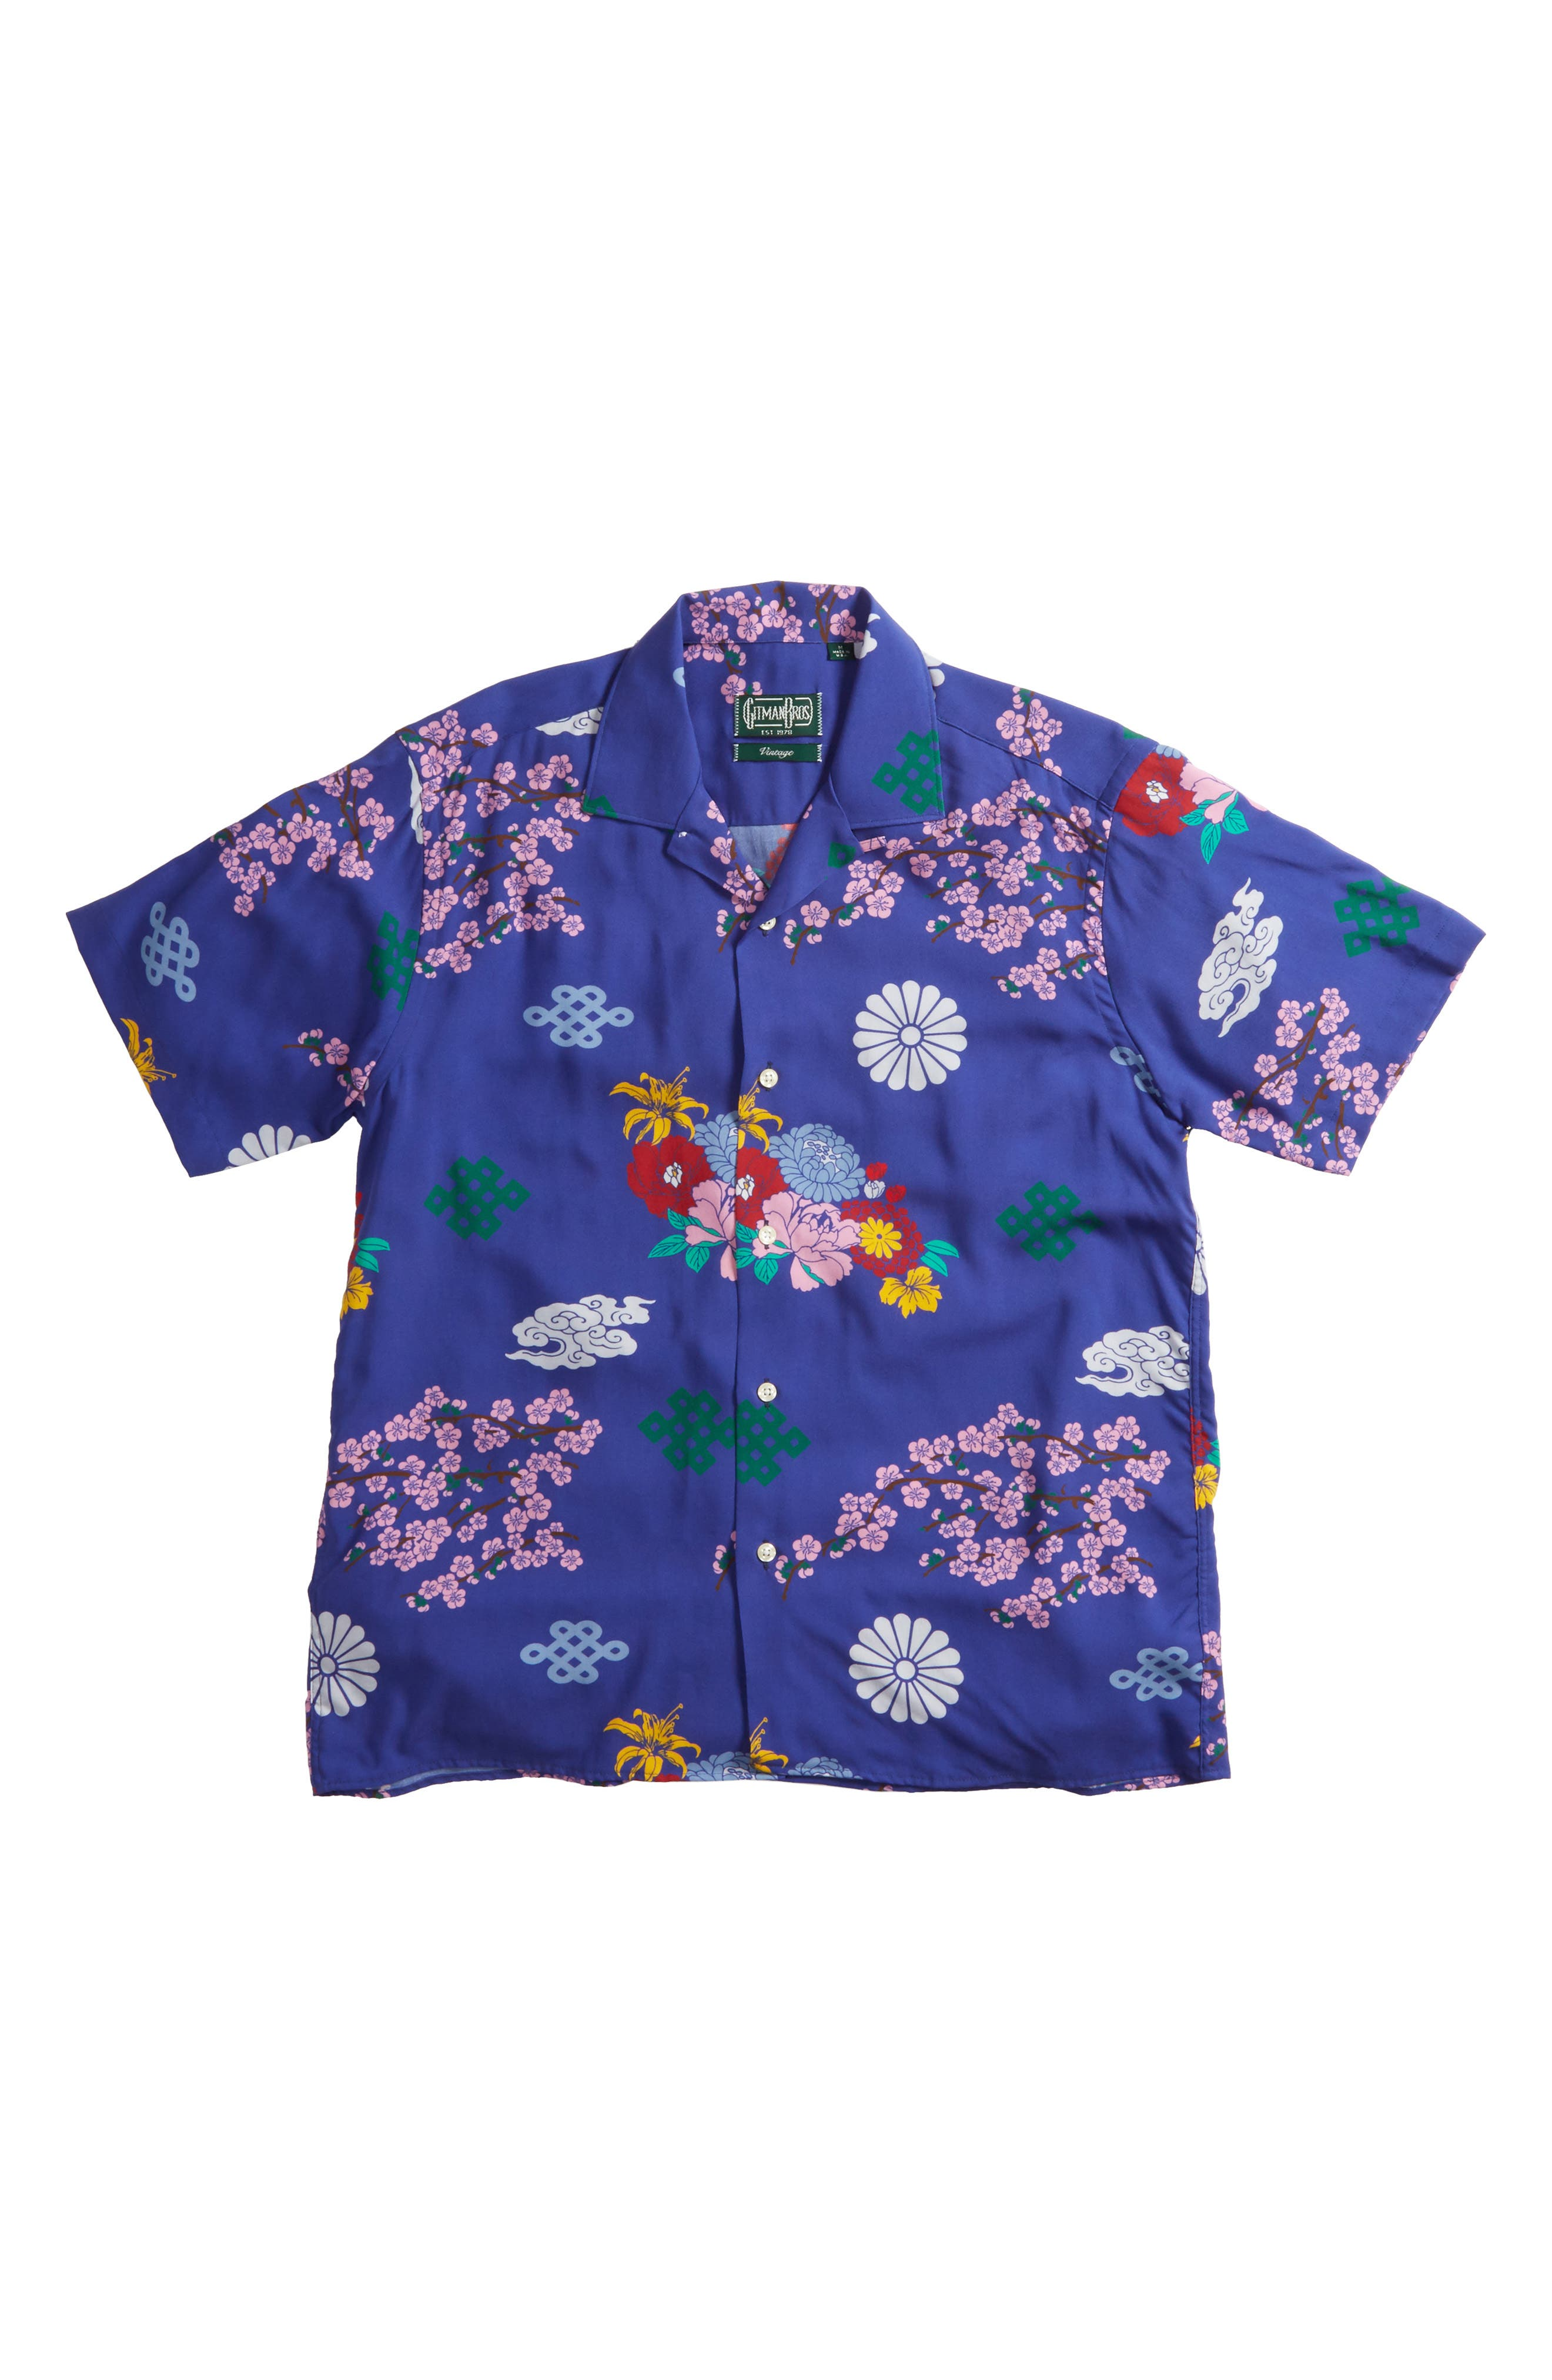 x The North Face Men's Floral Print Camp Shirt,                             Main thumbnail 1, color,                             Blue Ground